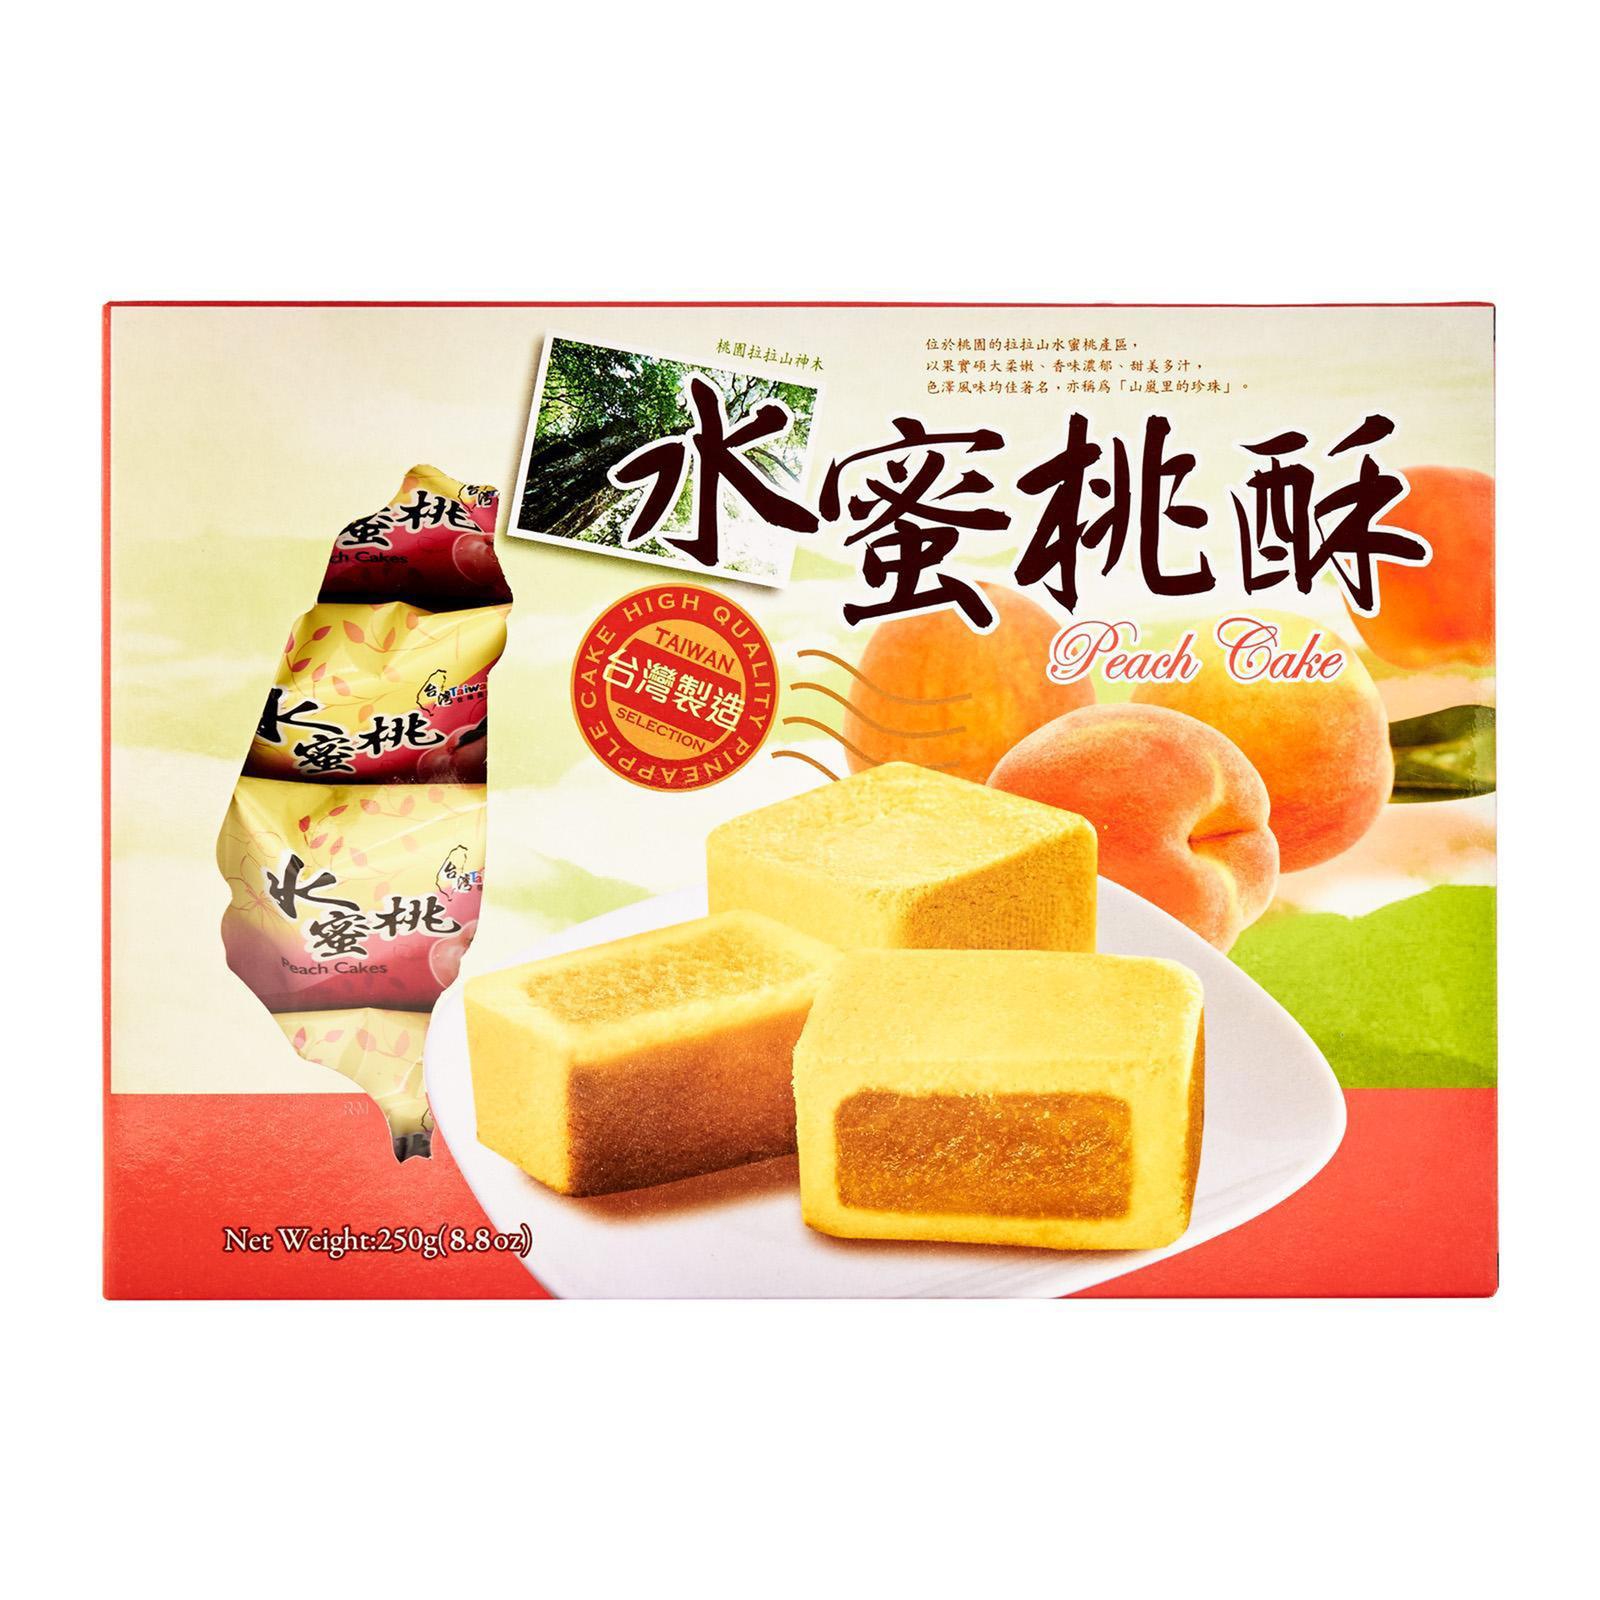 Bamboo House Cake - Peach